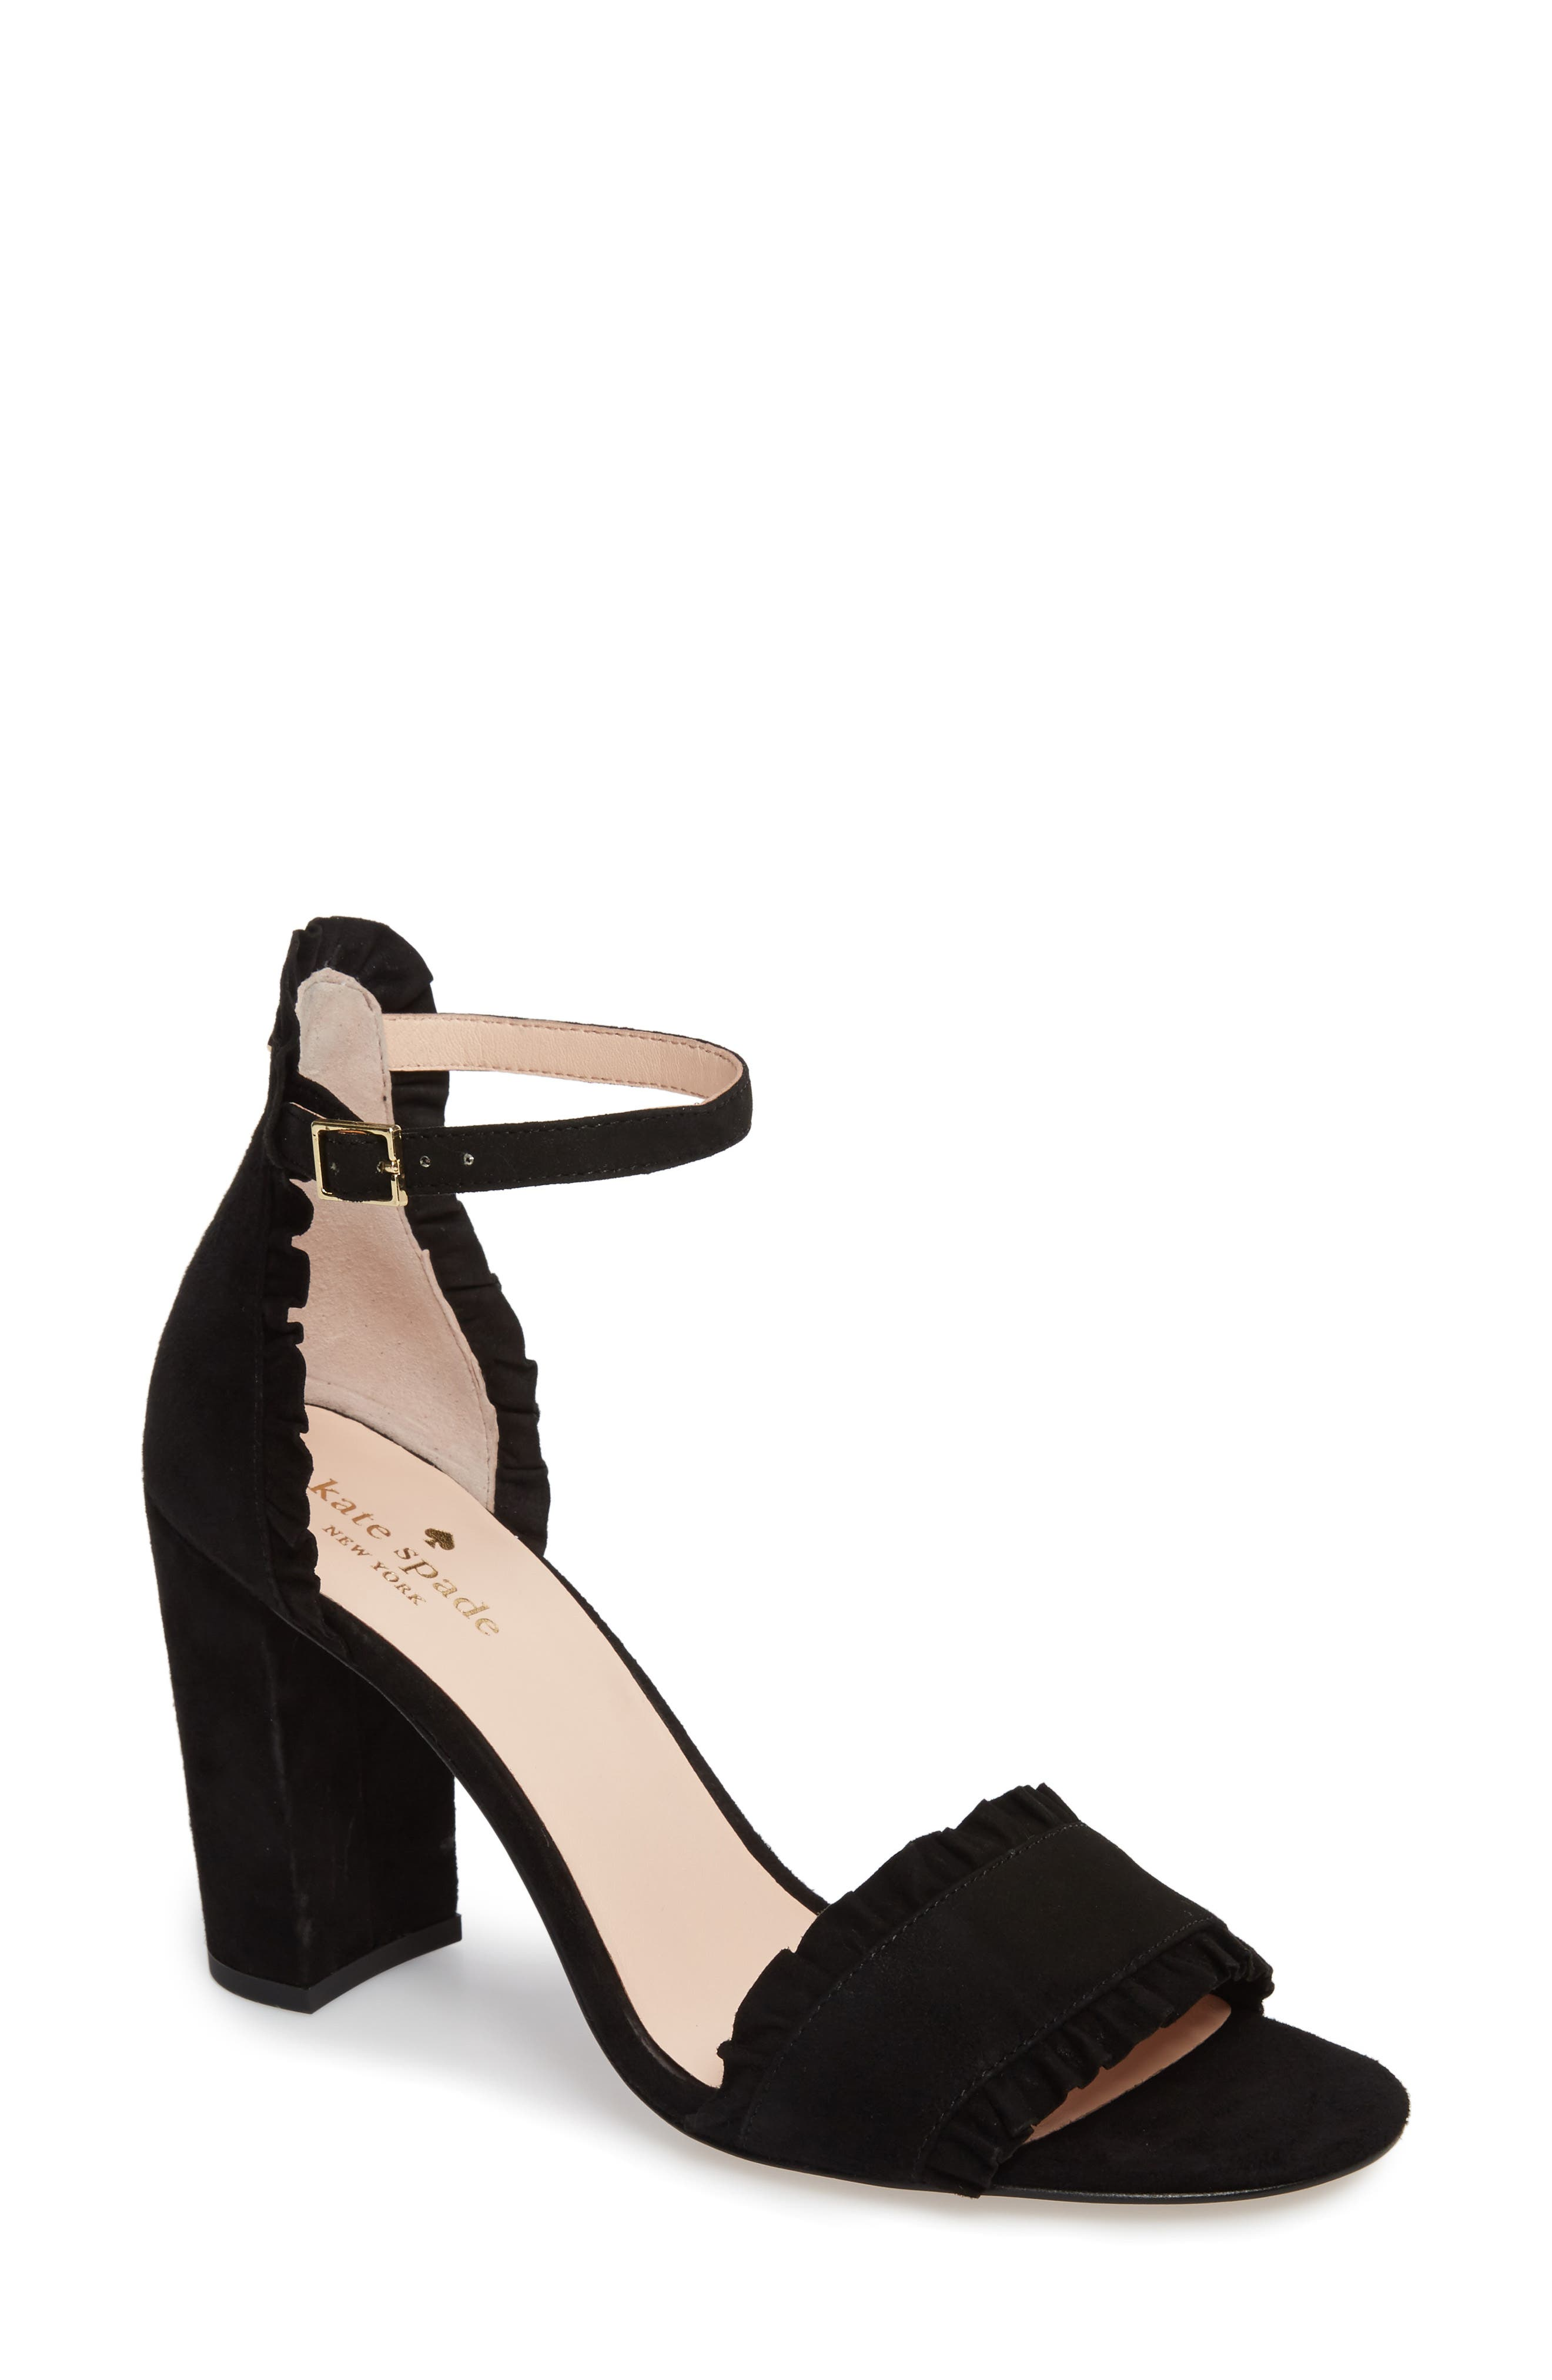 odele ruffle sandal,                             Main thumbnail 1, color,                             Black Suede